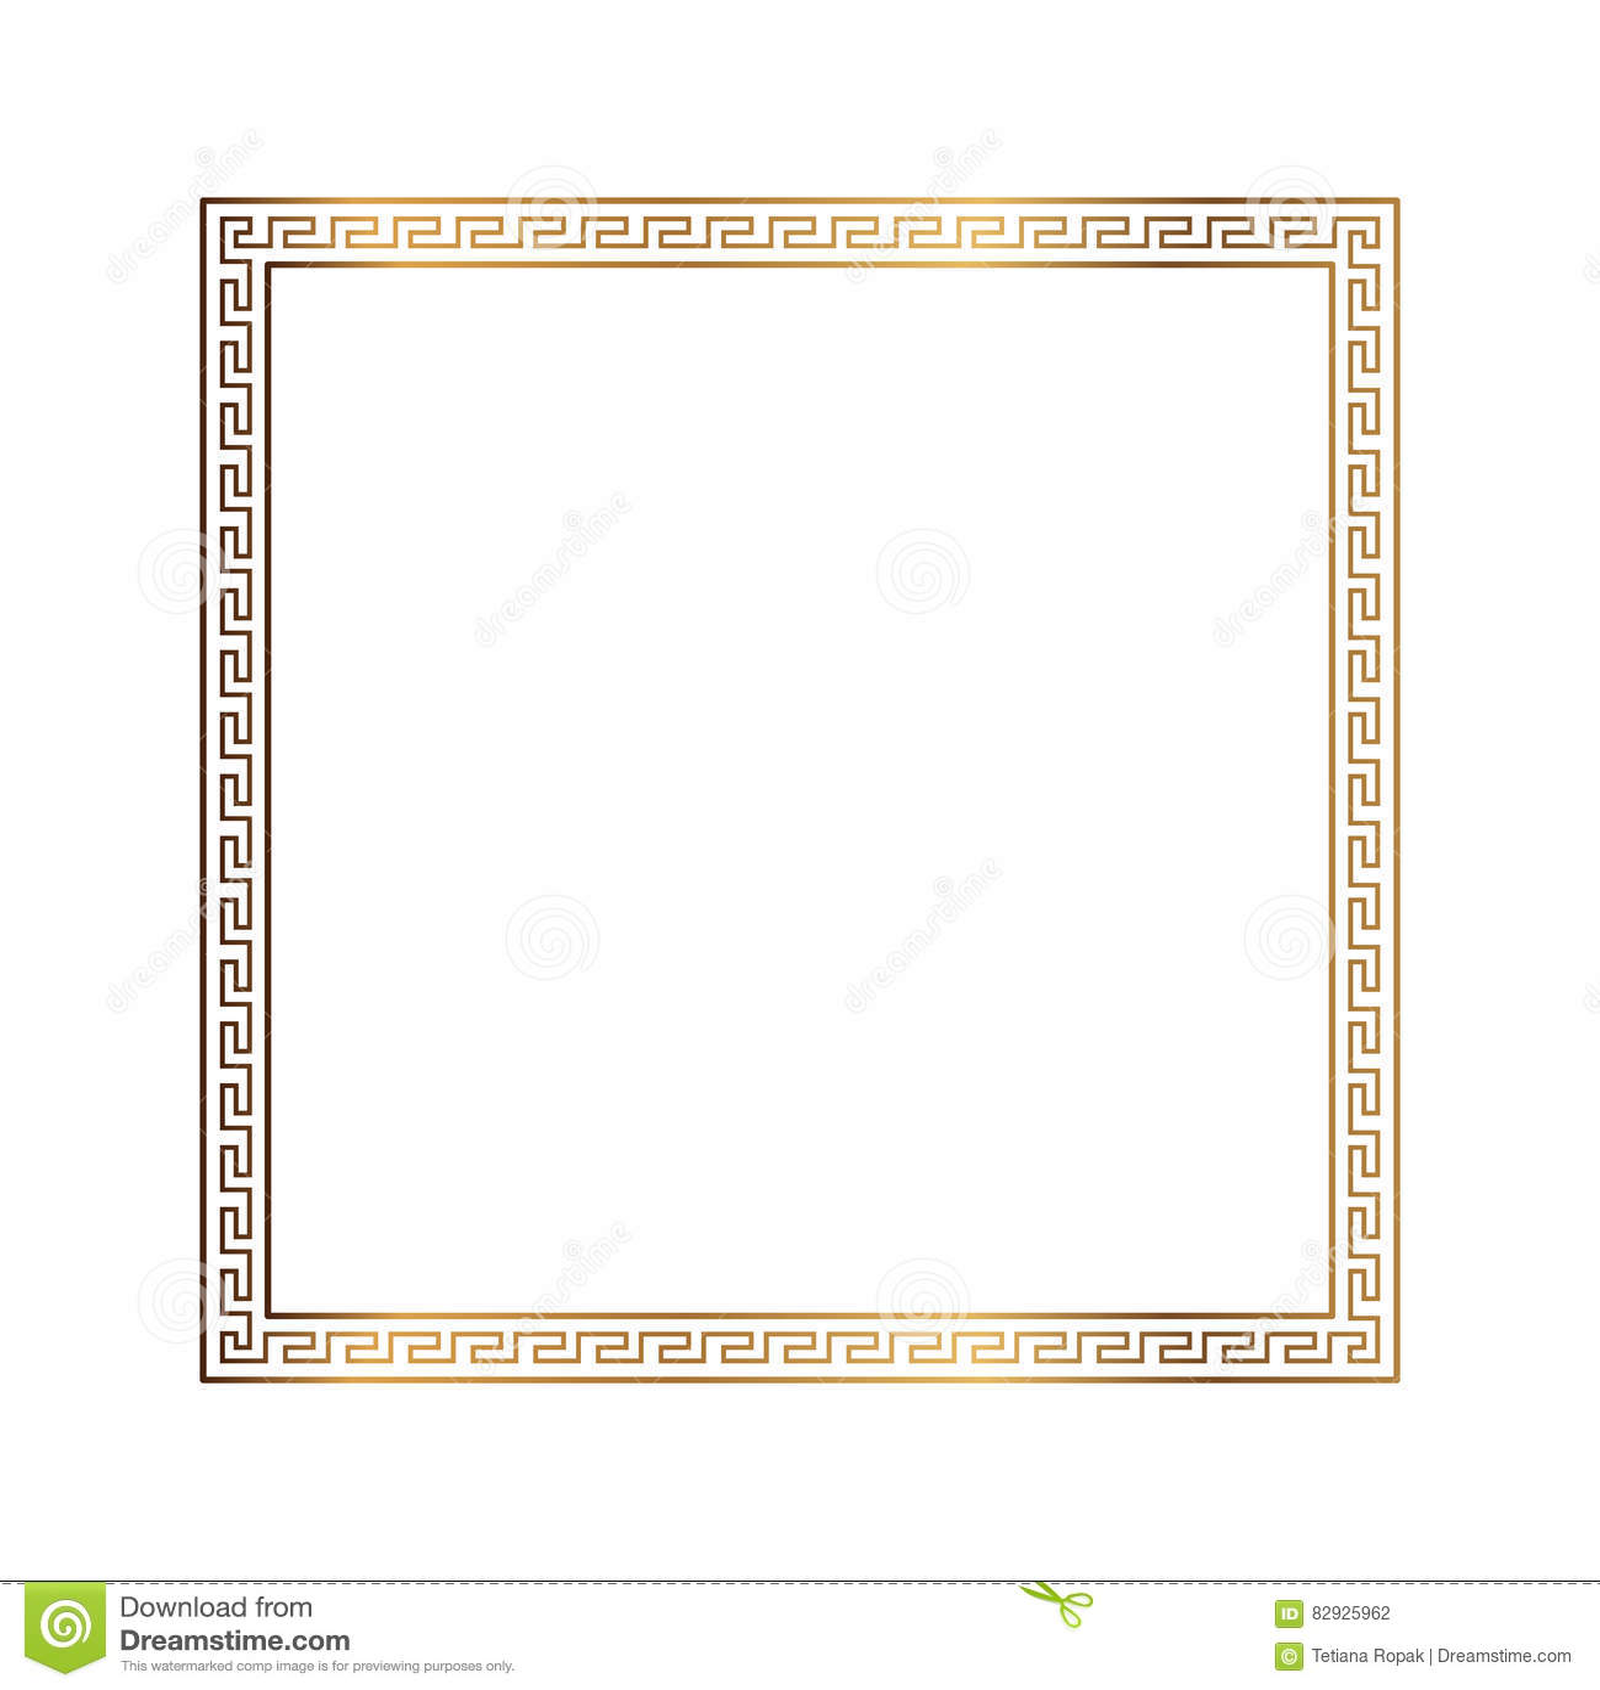 Greek style ornamental decorative frame pattern isolated. Greek Ornament. Vector antique frame pack. Decoration element patterns